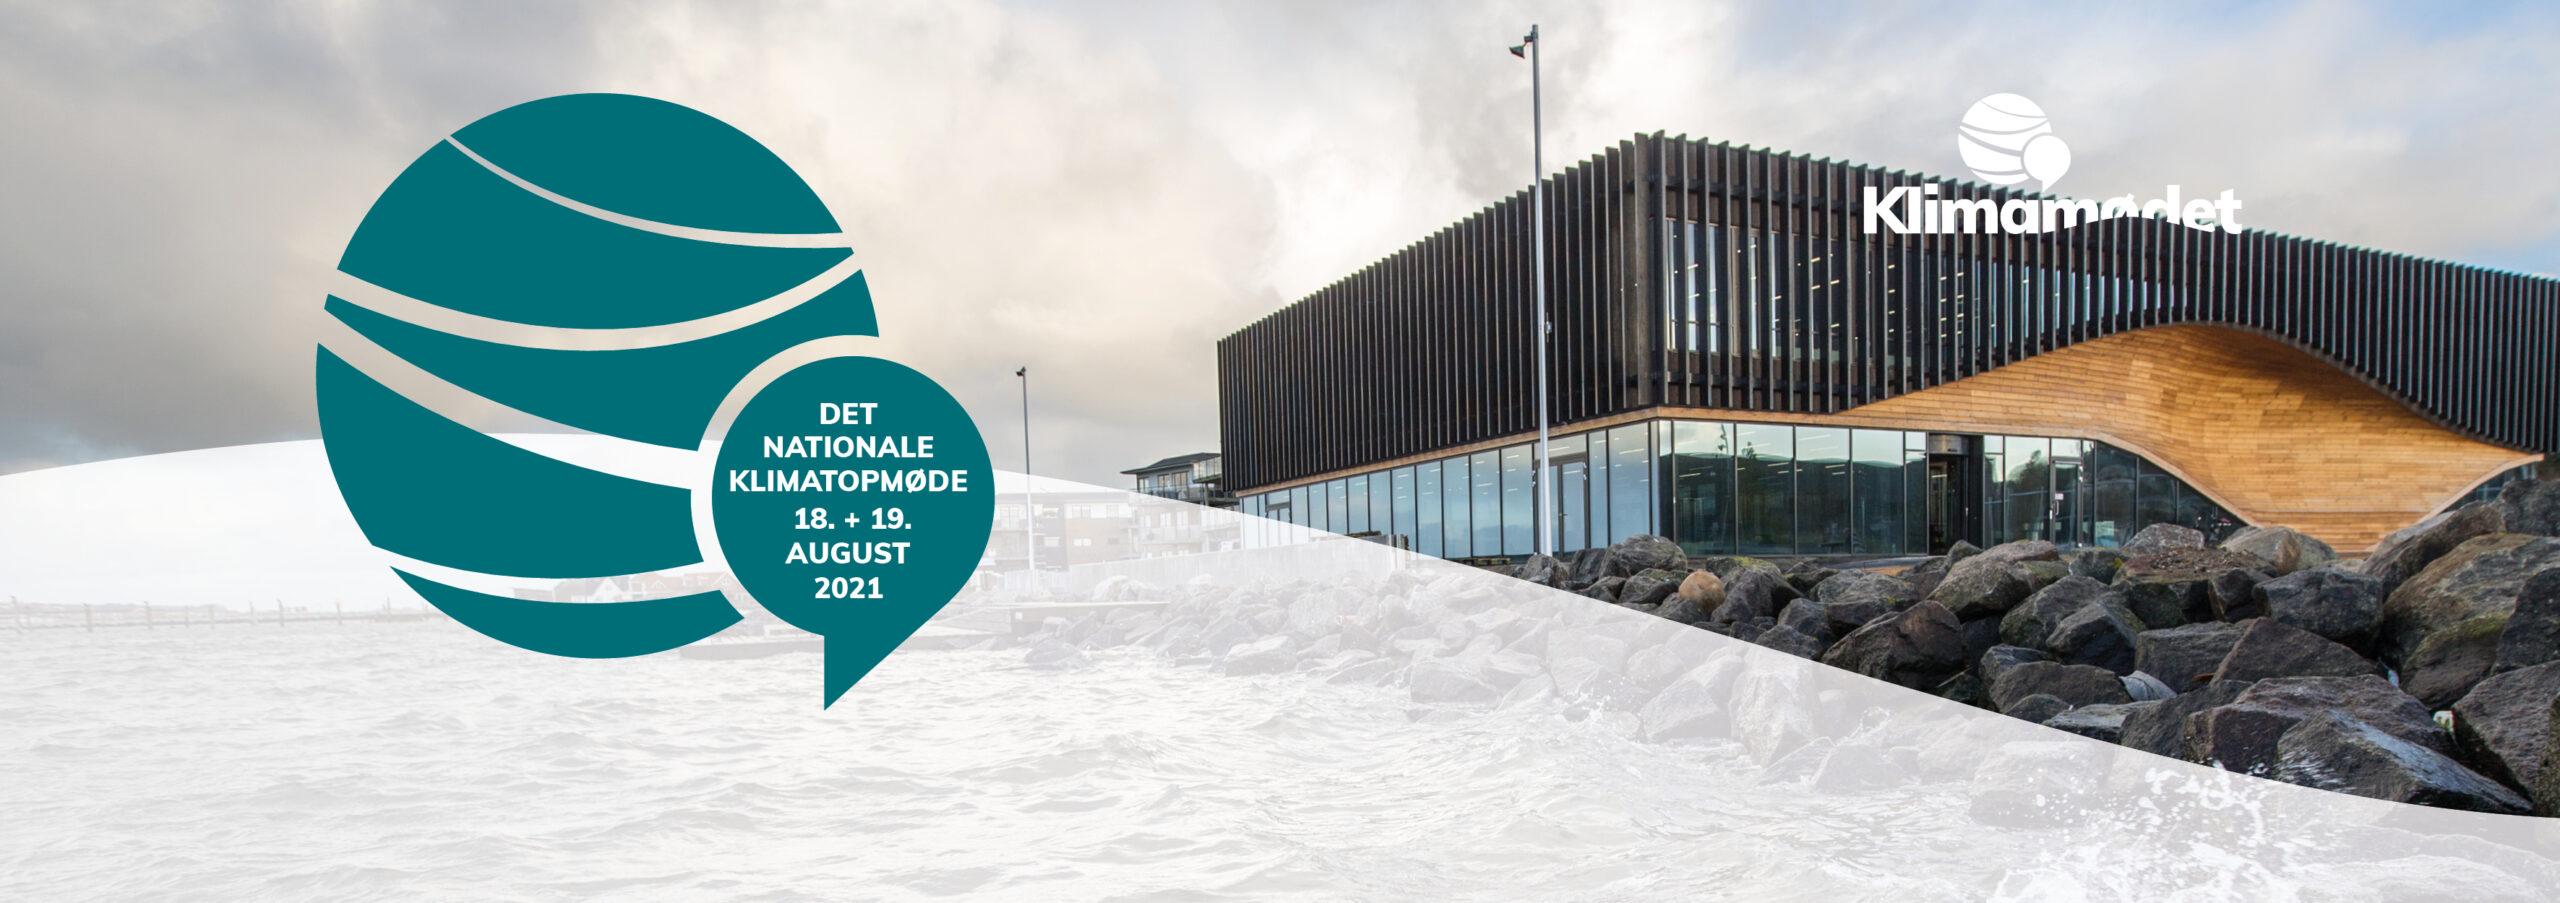 Klimatopmøde Klimatorium